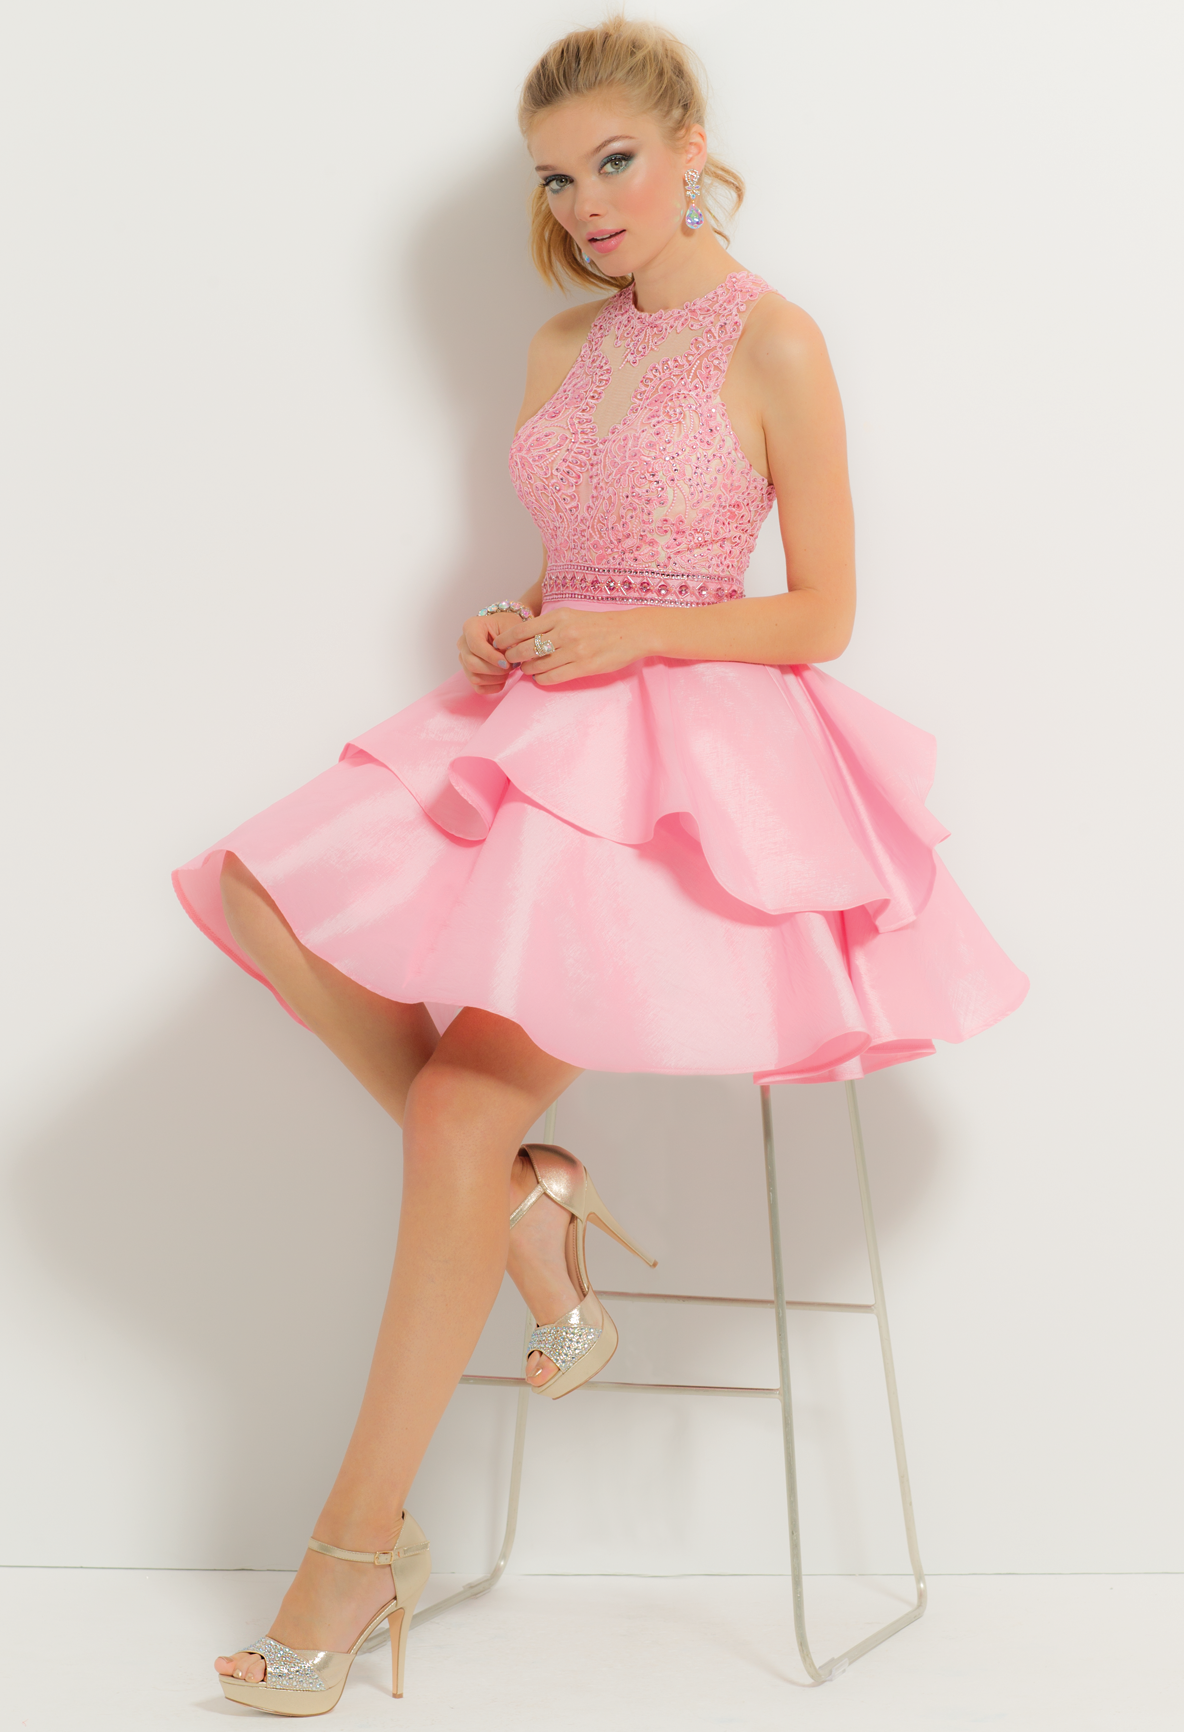 Beaded Illusion Tier Short Dress | Taffeta skirt, Illusions and Bodice